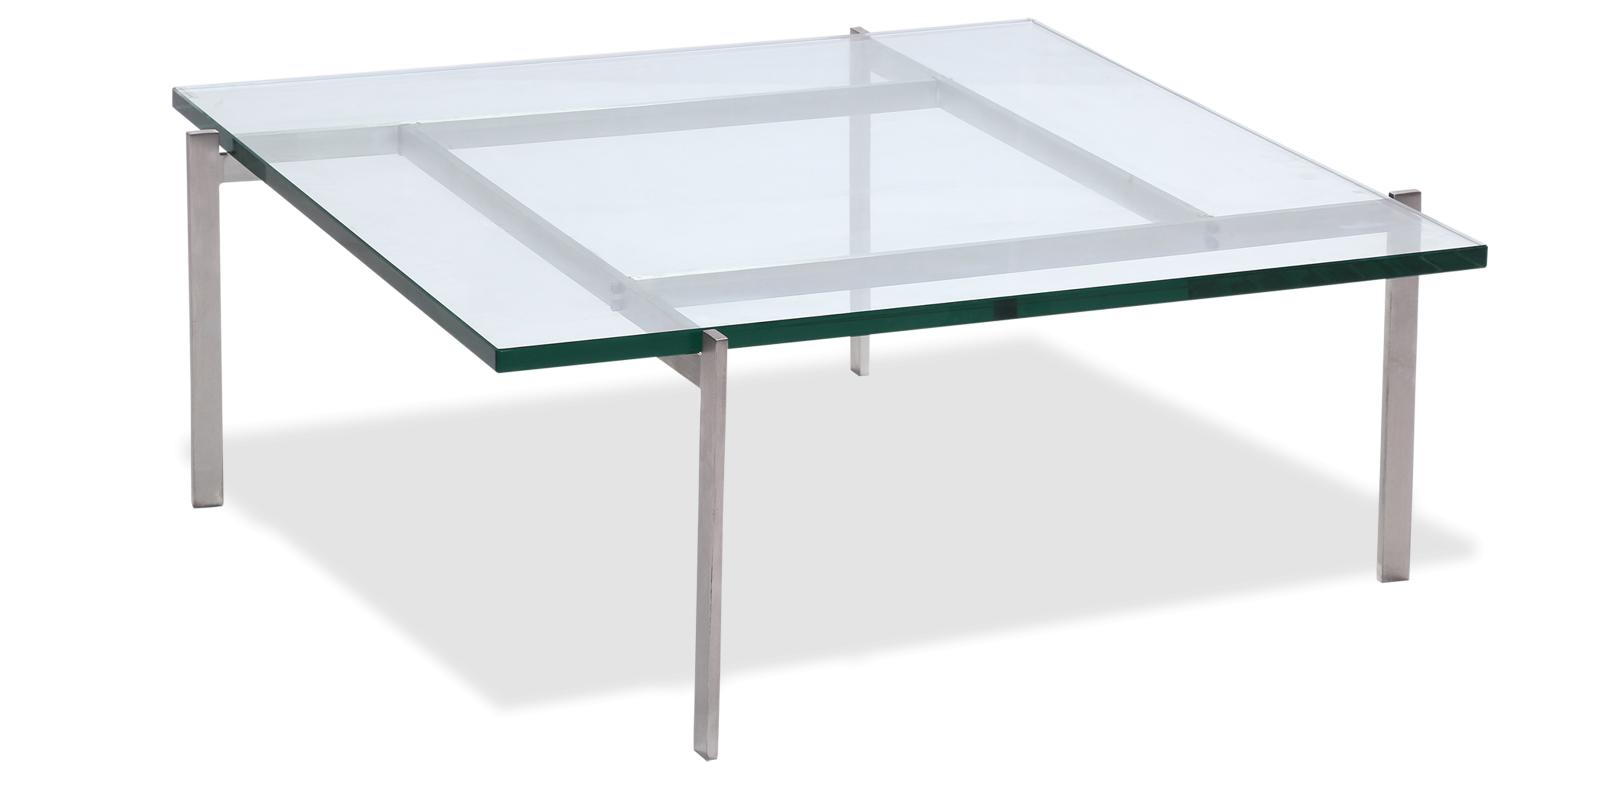 table-basse-pk61-2-TAB0411-1_4